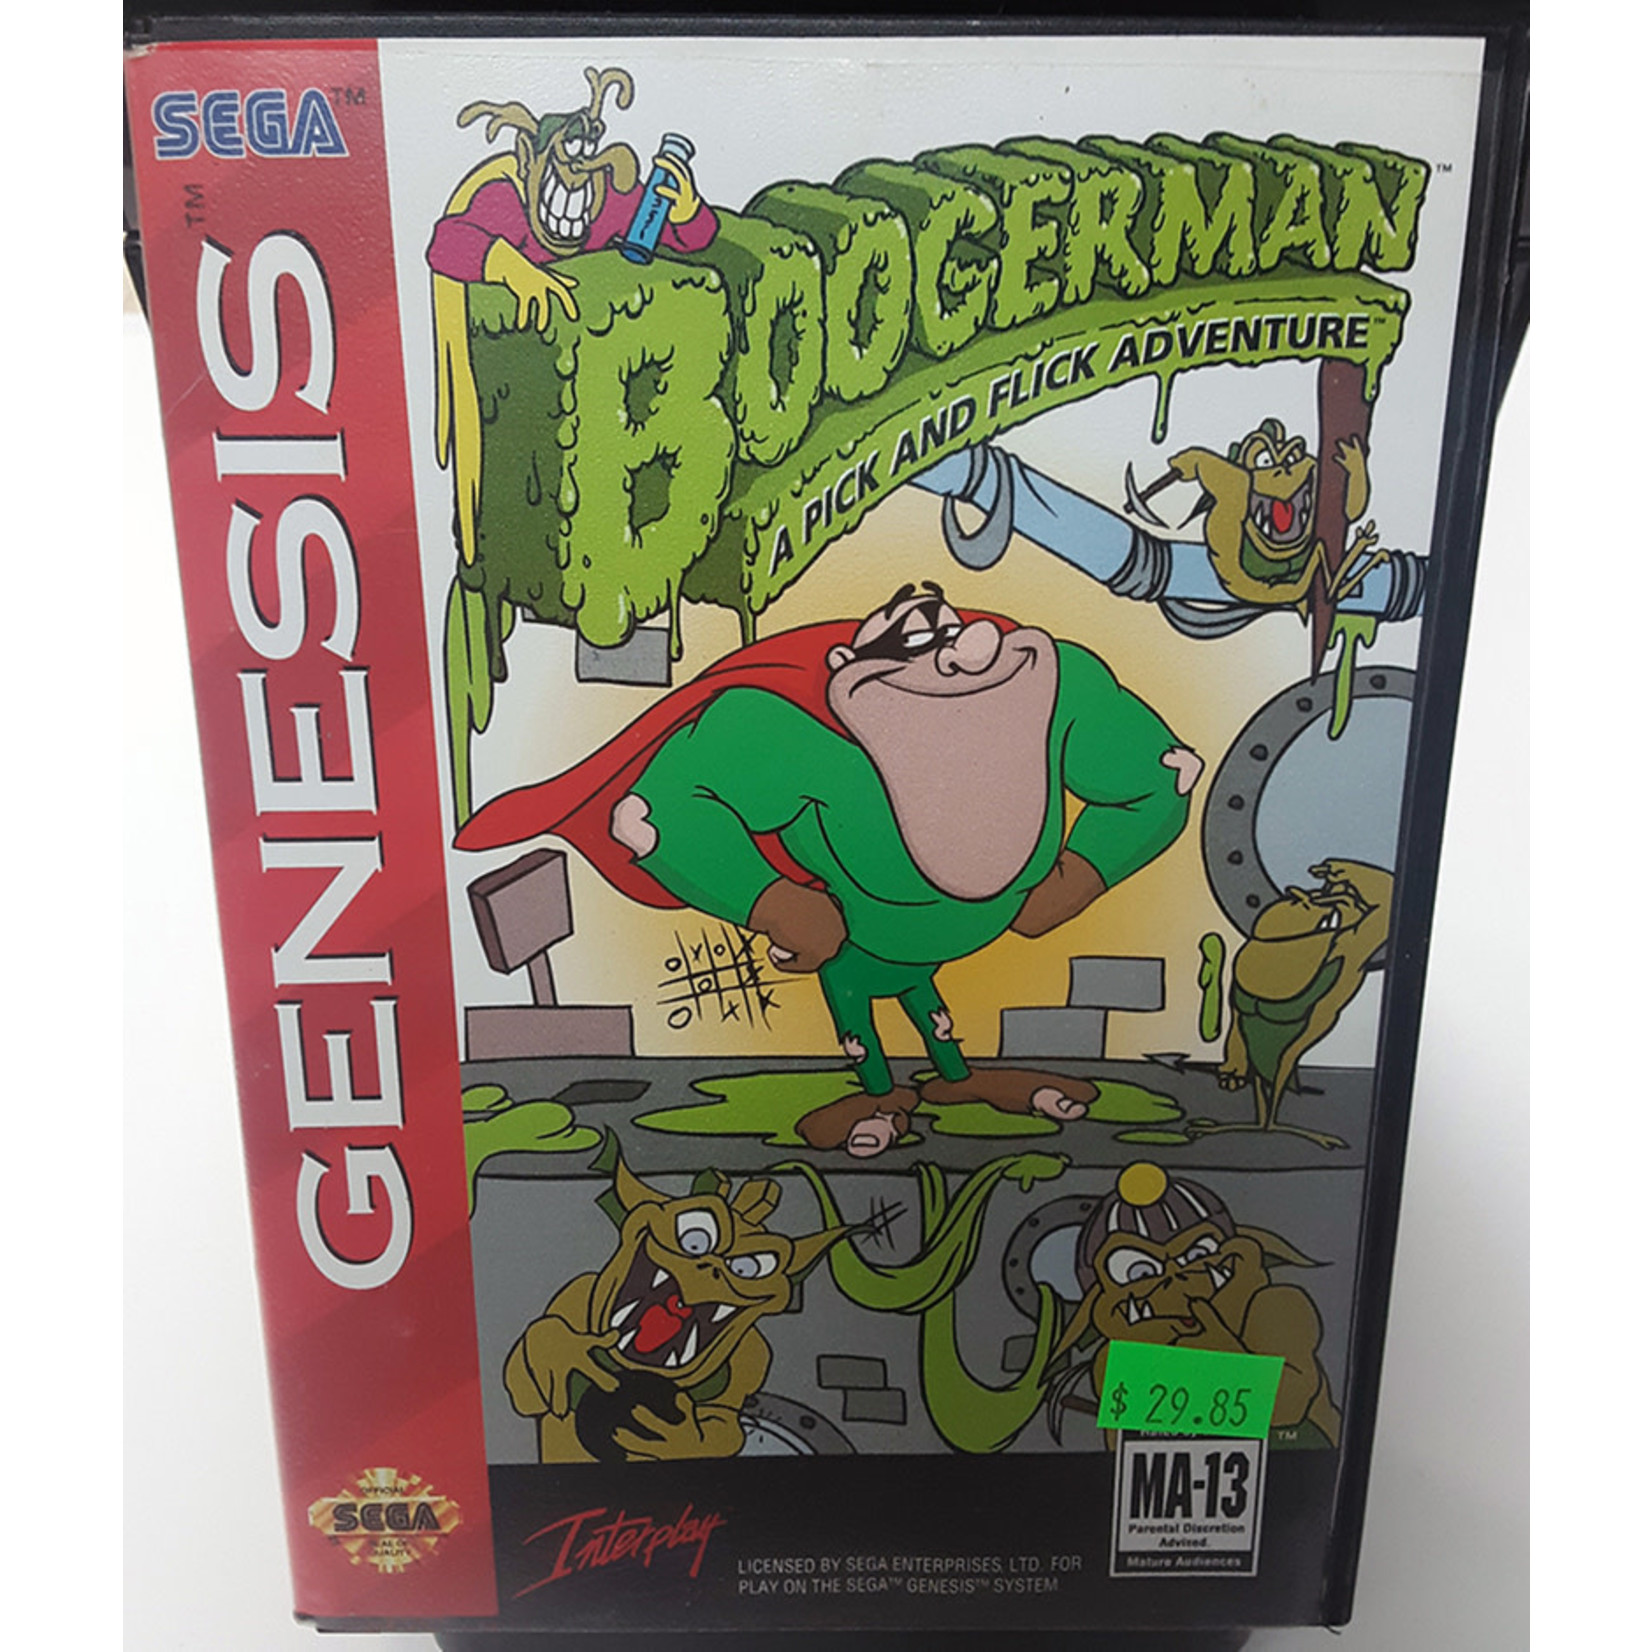 sgu-Boogerman A Pick and Flick Adventure in box (cartridge)